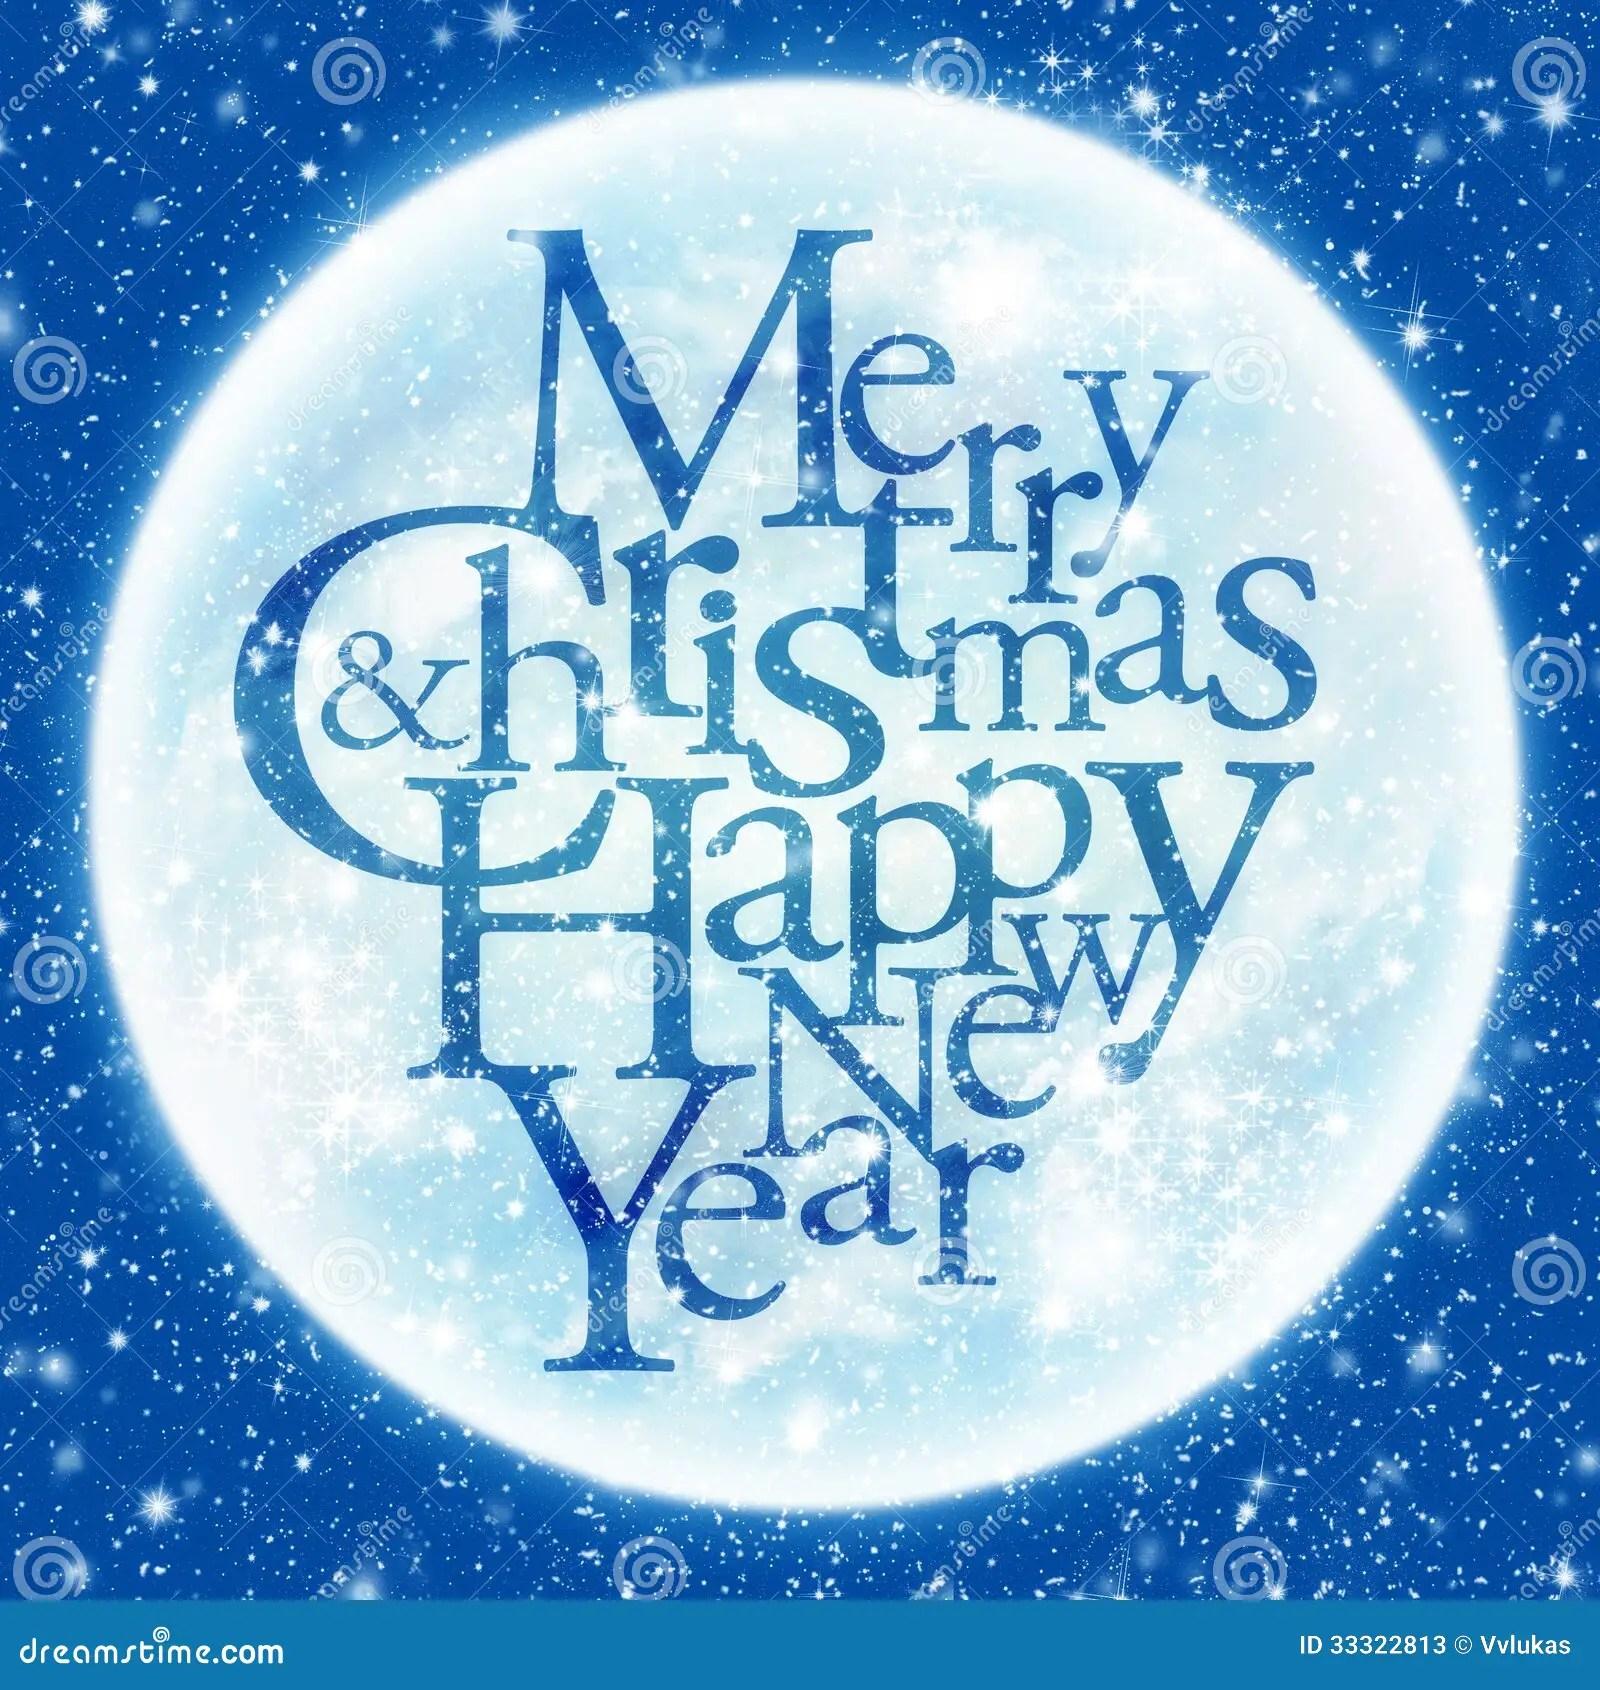 merry christmas new year greetings